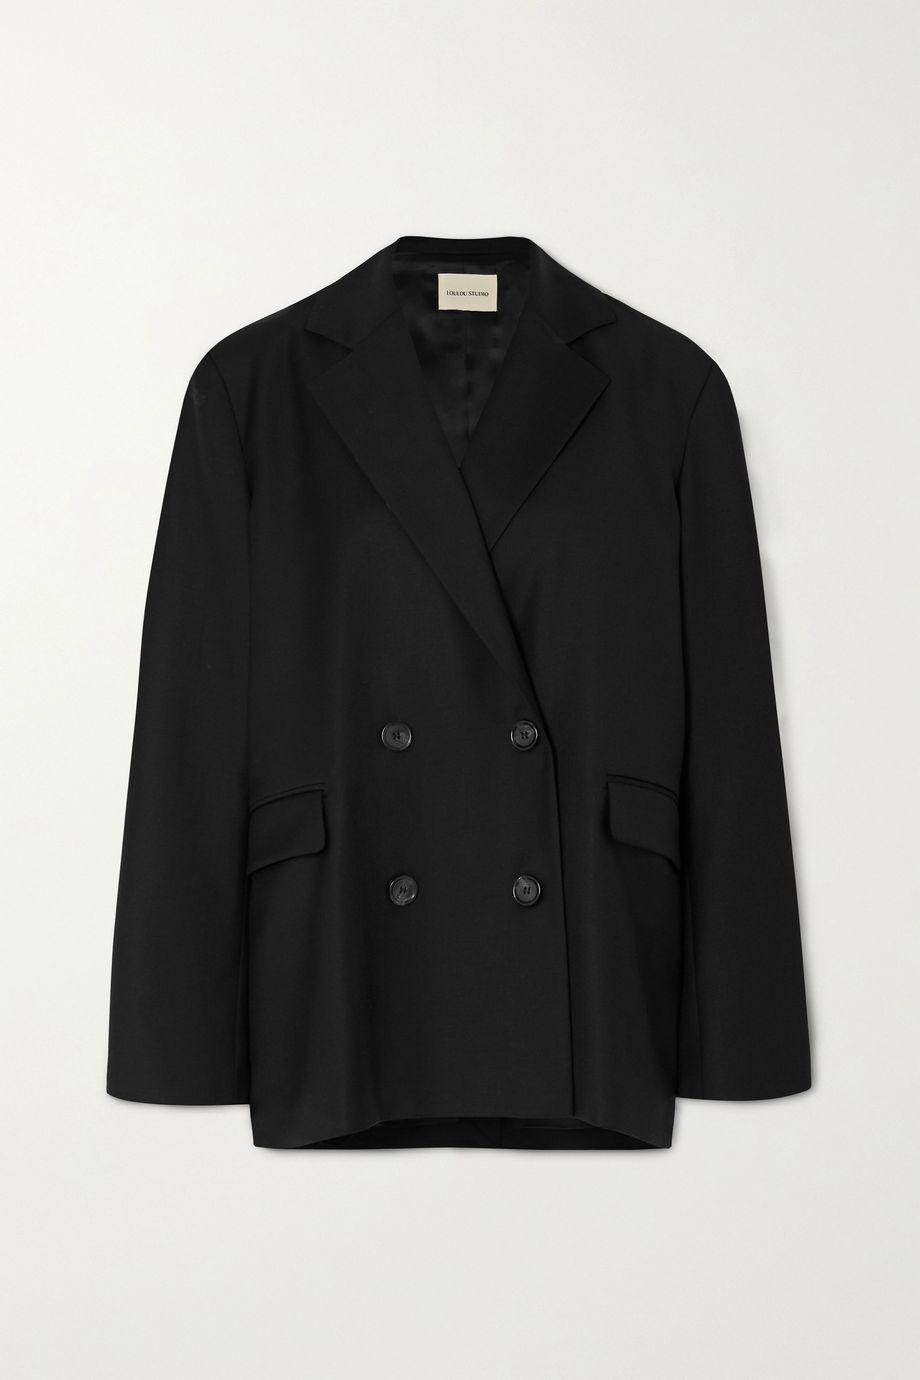 LOULOU STUDIO Tatakoto double-breasted wool-twill blazer